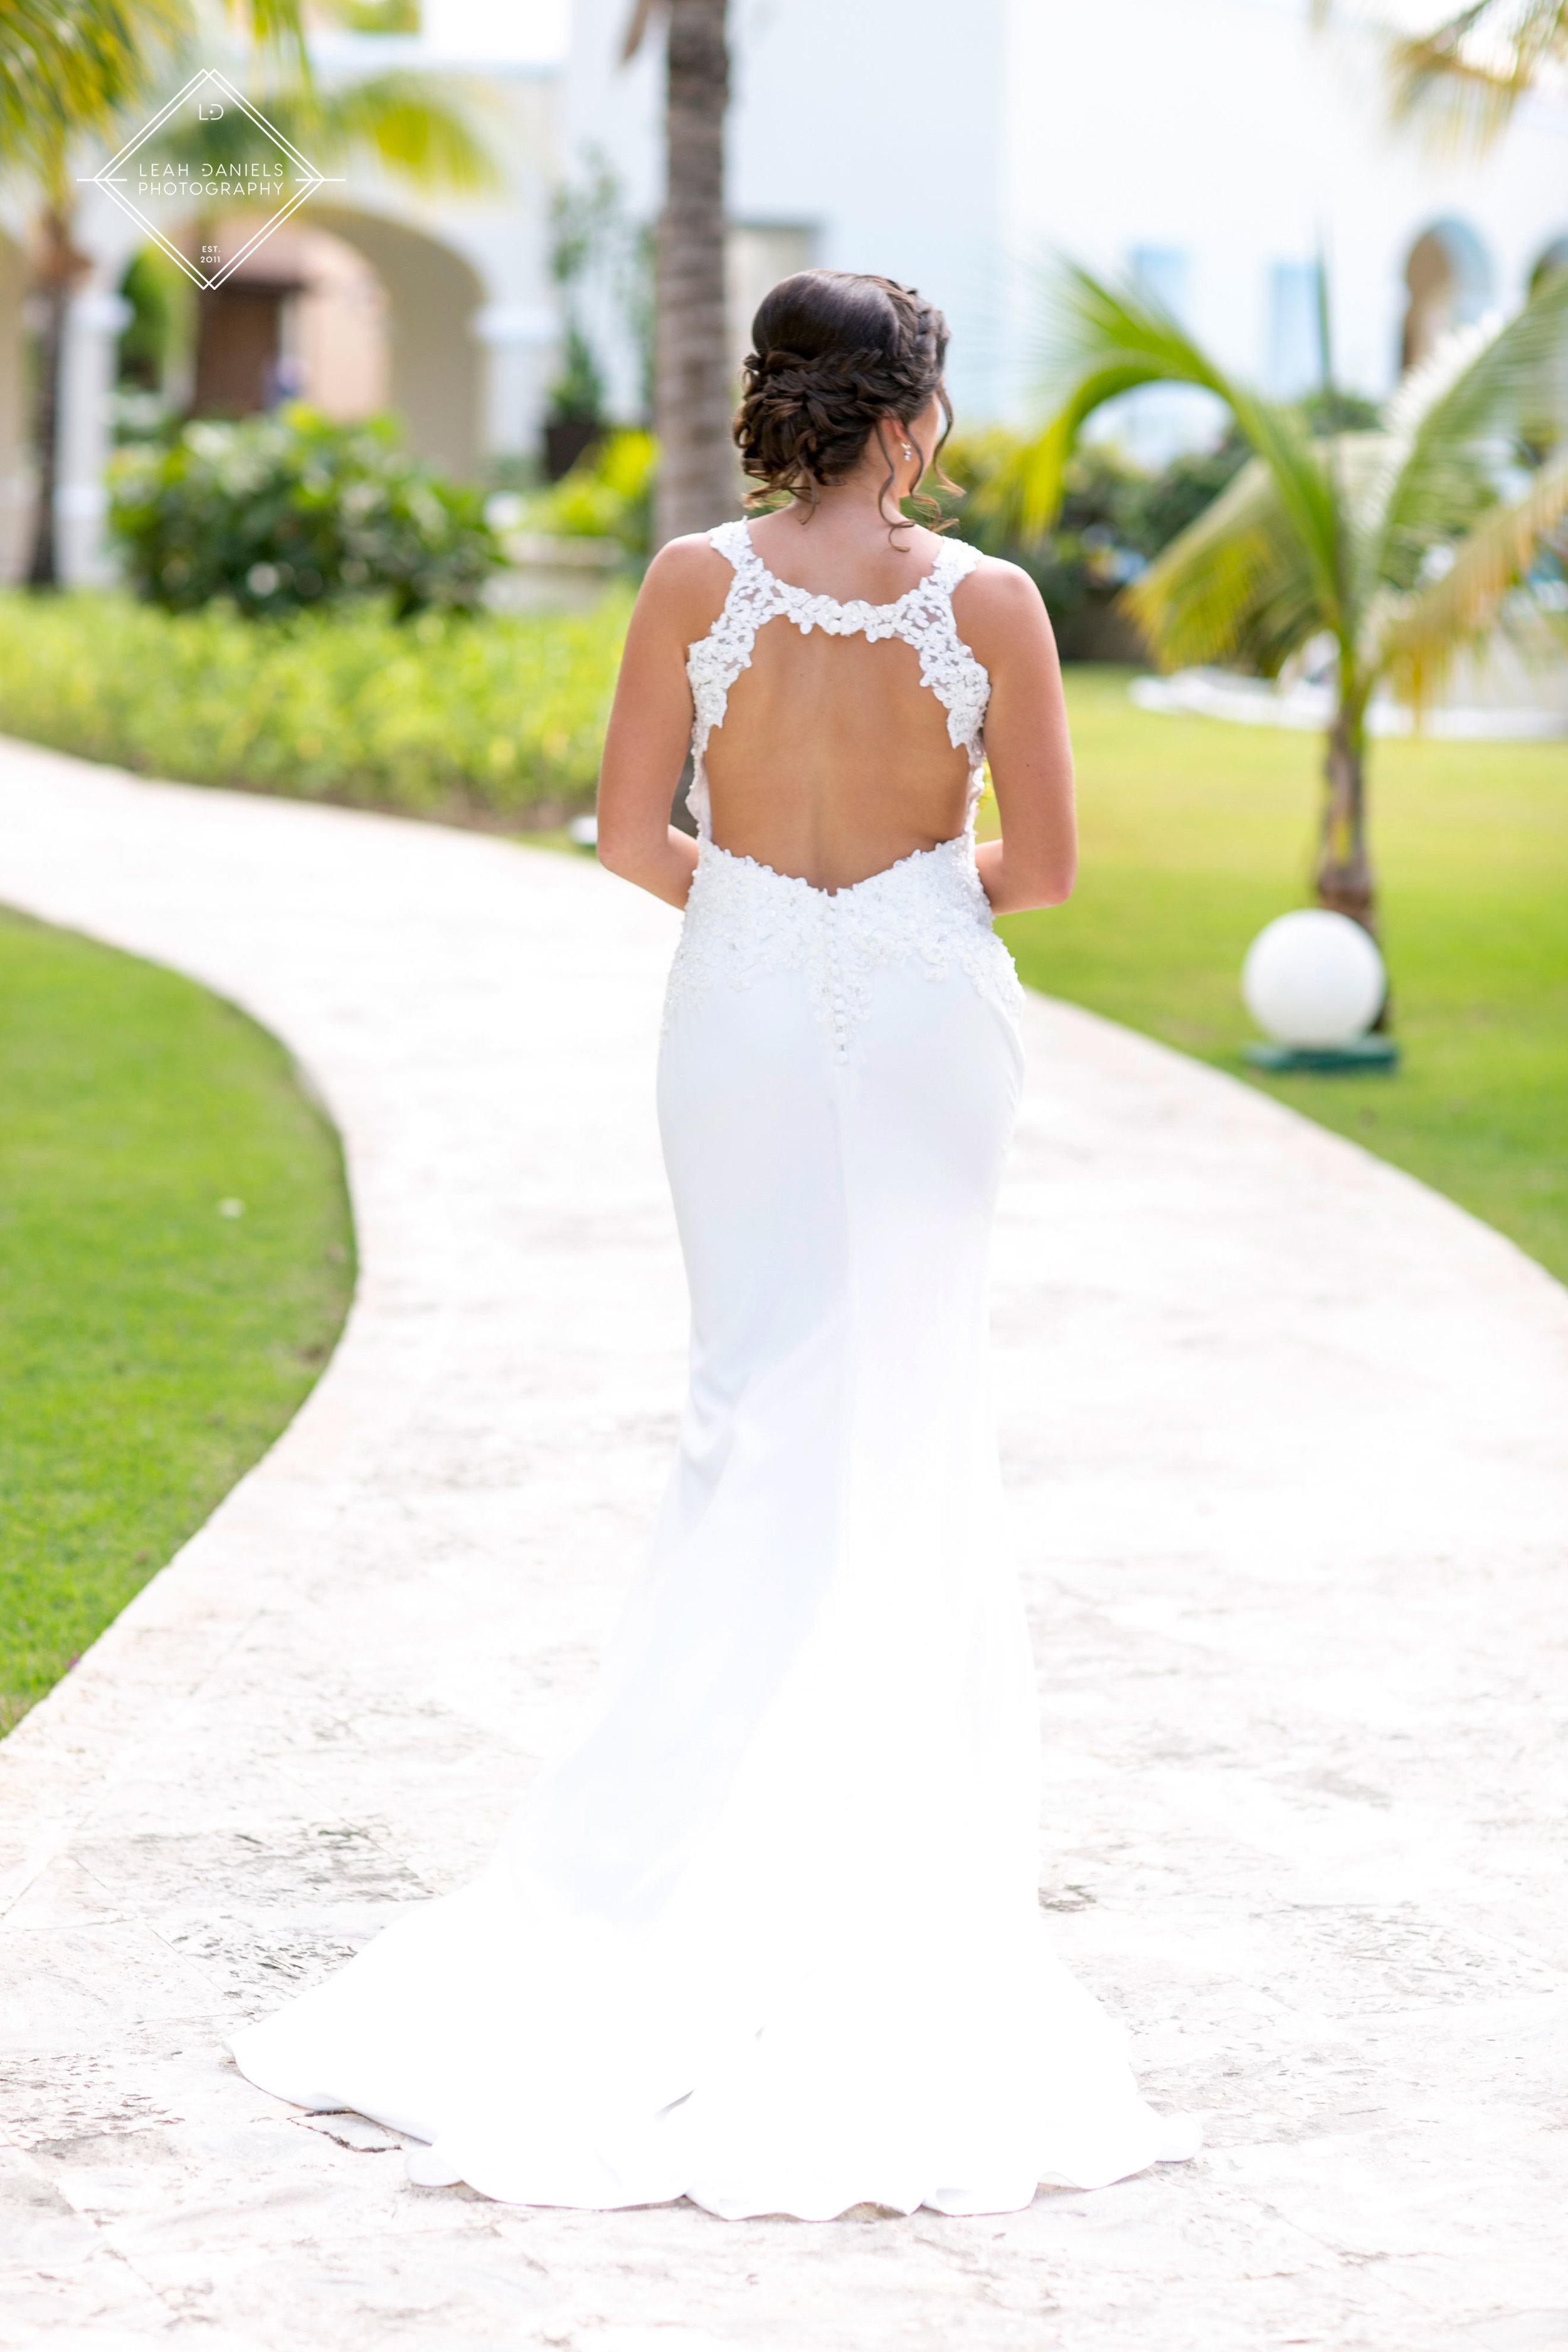 NOW Larimar Destination Wedding; The Bride